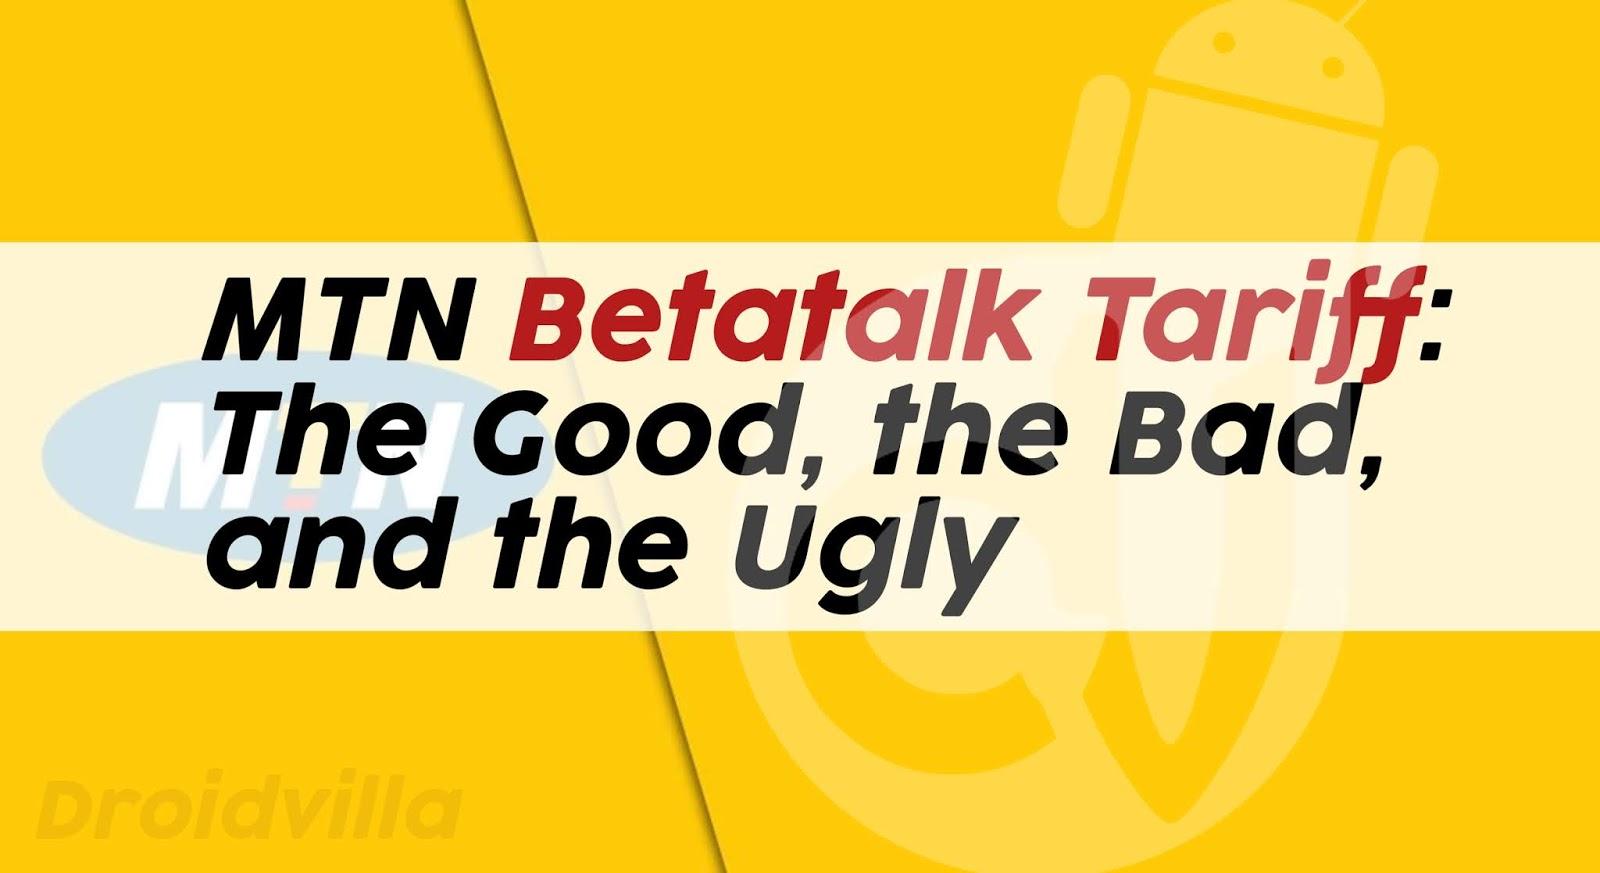 MTN betatalk Tariff code